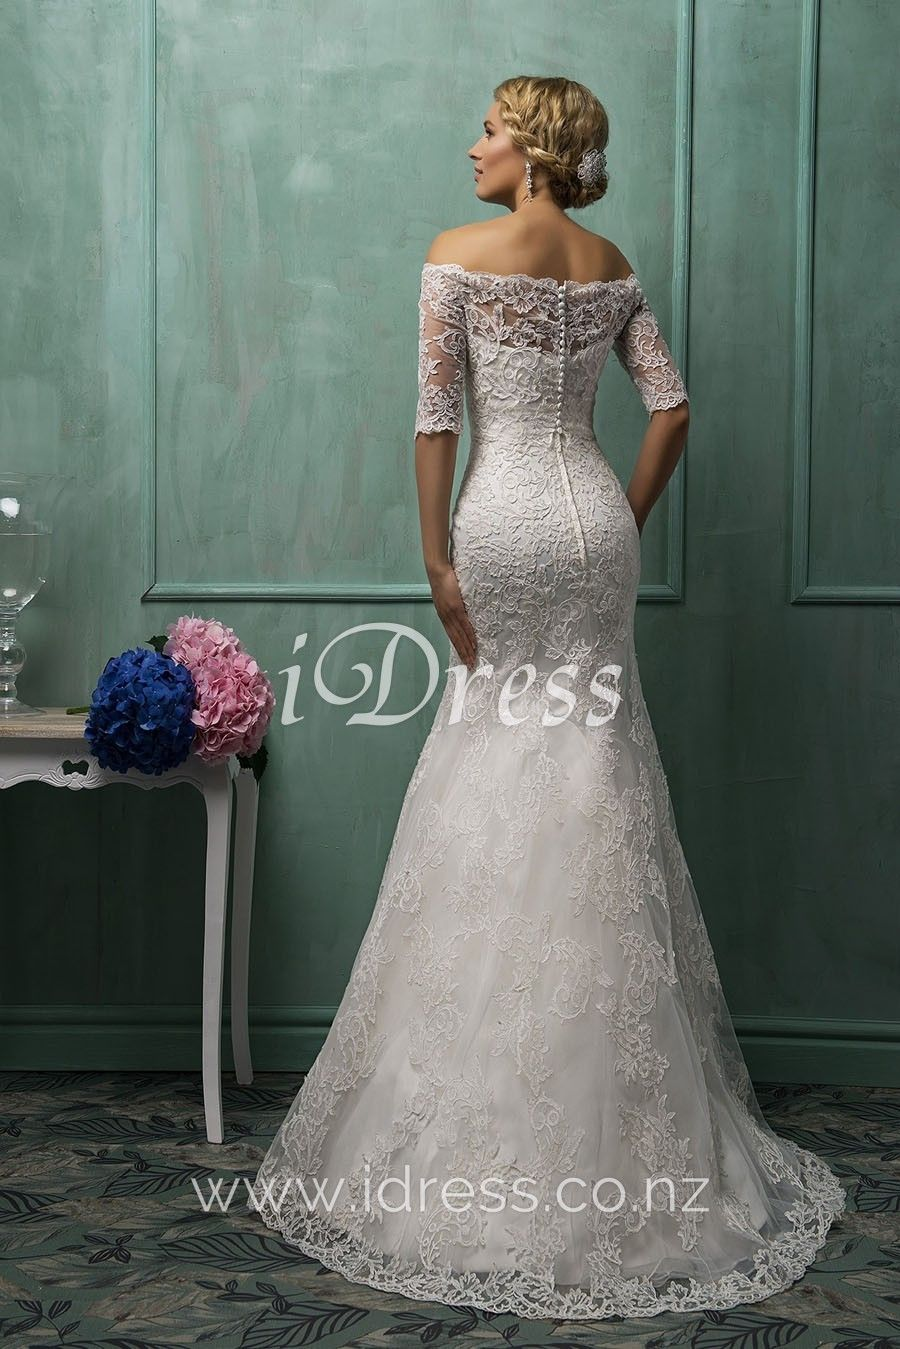 Elegant Vintage Off White Lace Mermaid Wedding Gown Modest Bridal Gowns Long Vintage Wedding Dress Wedding Dresses [ 1349 x 900 Pixel ]